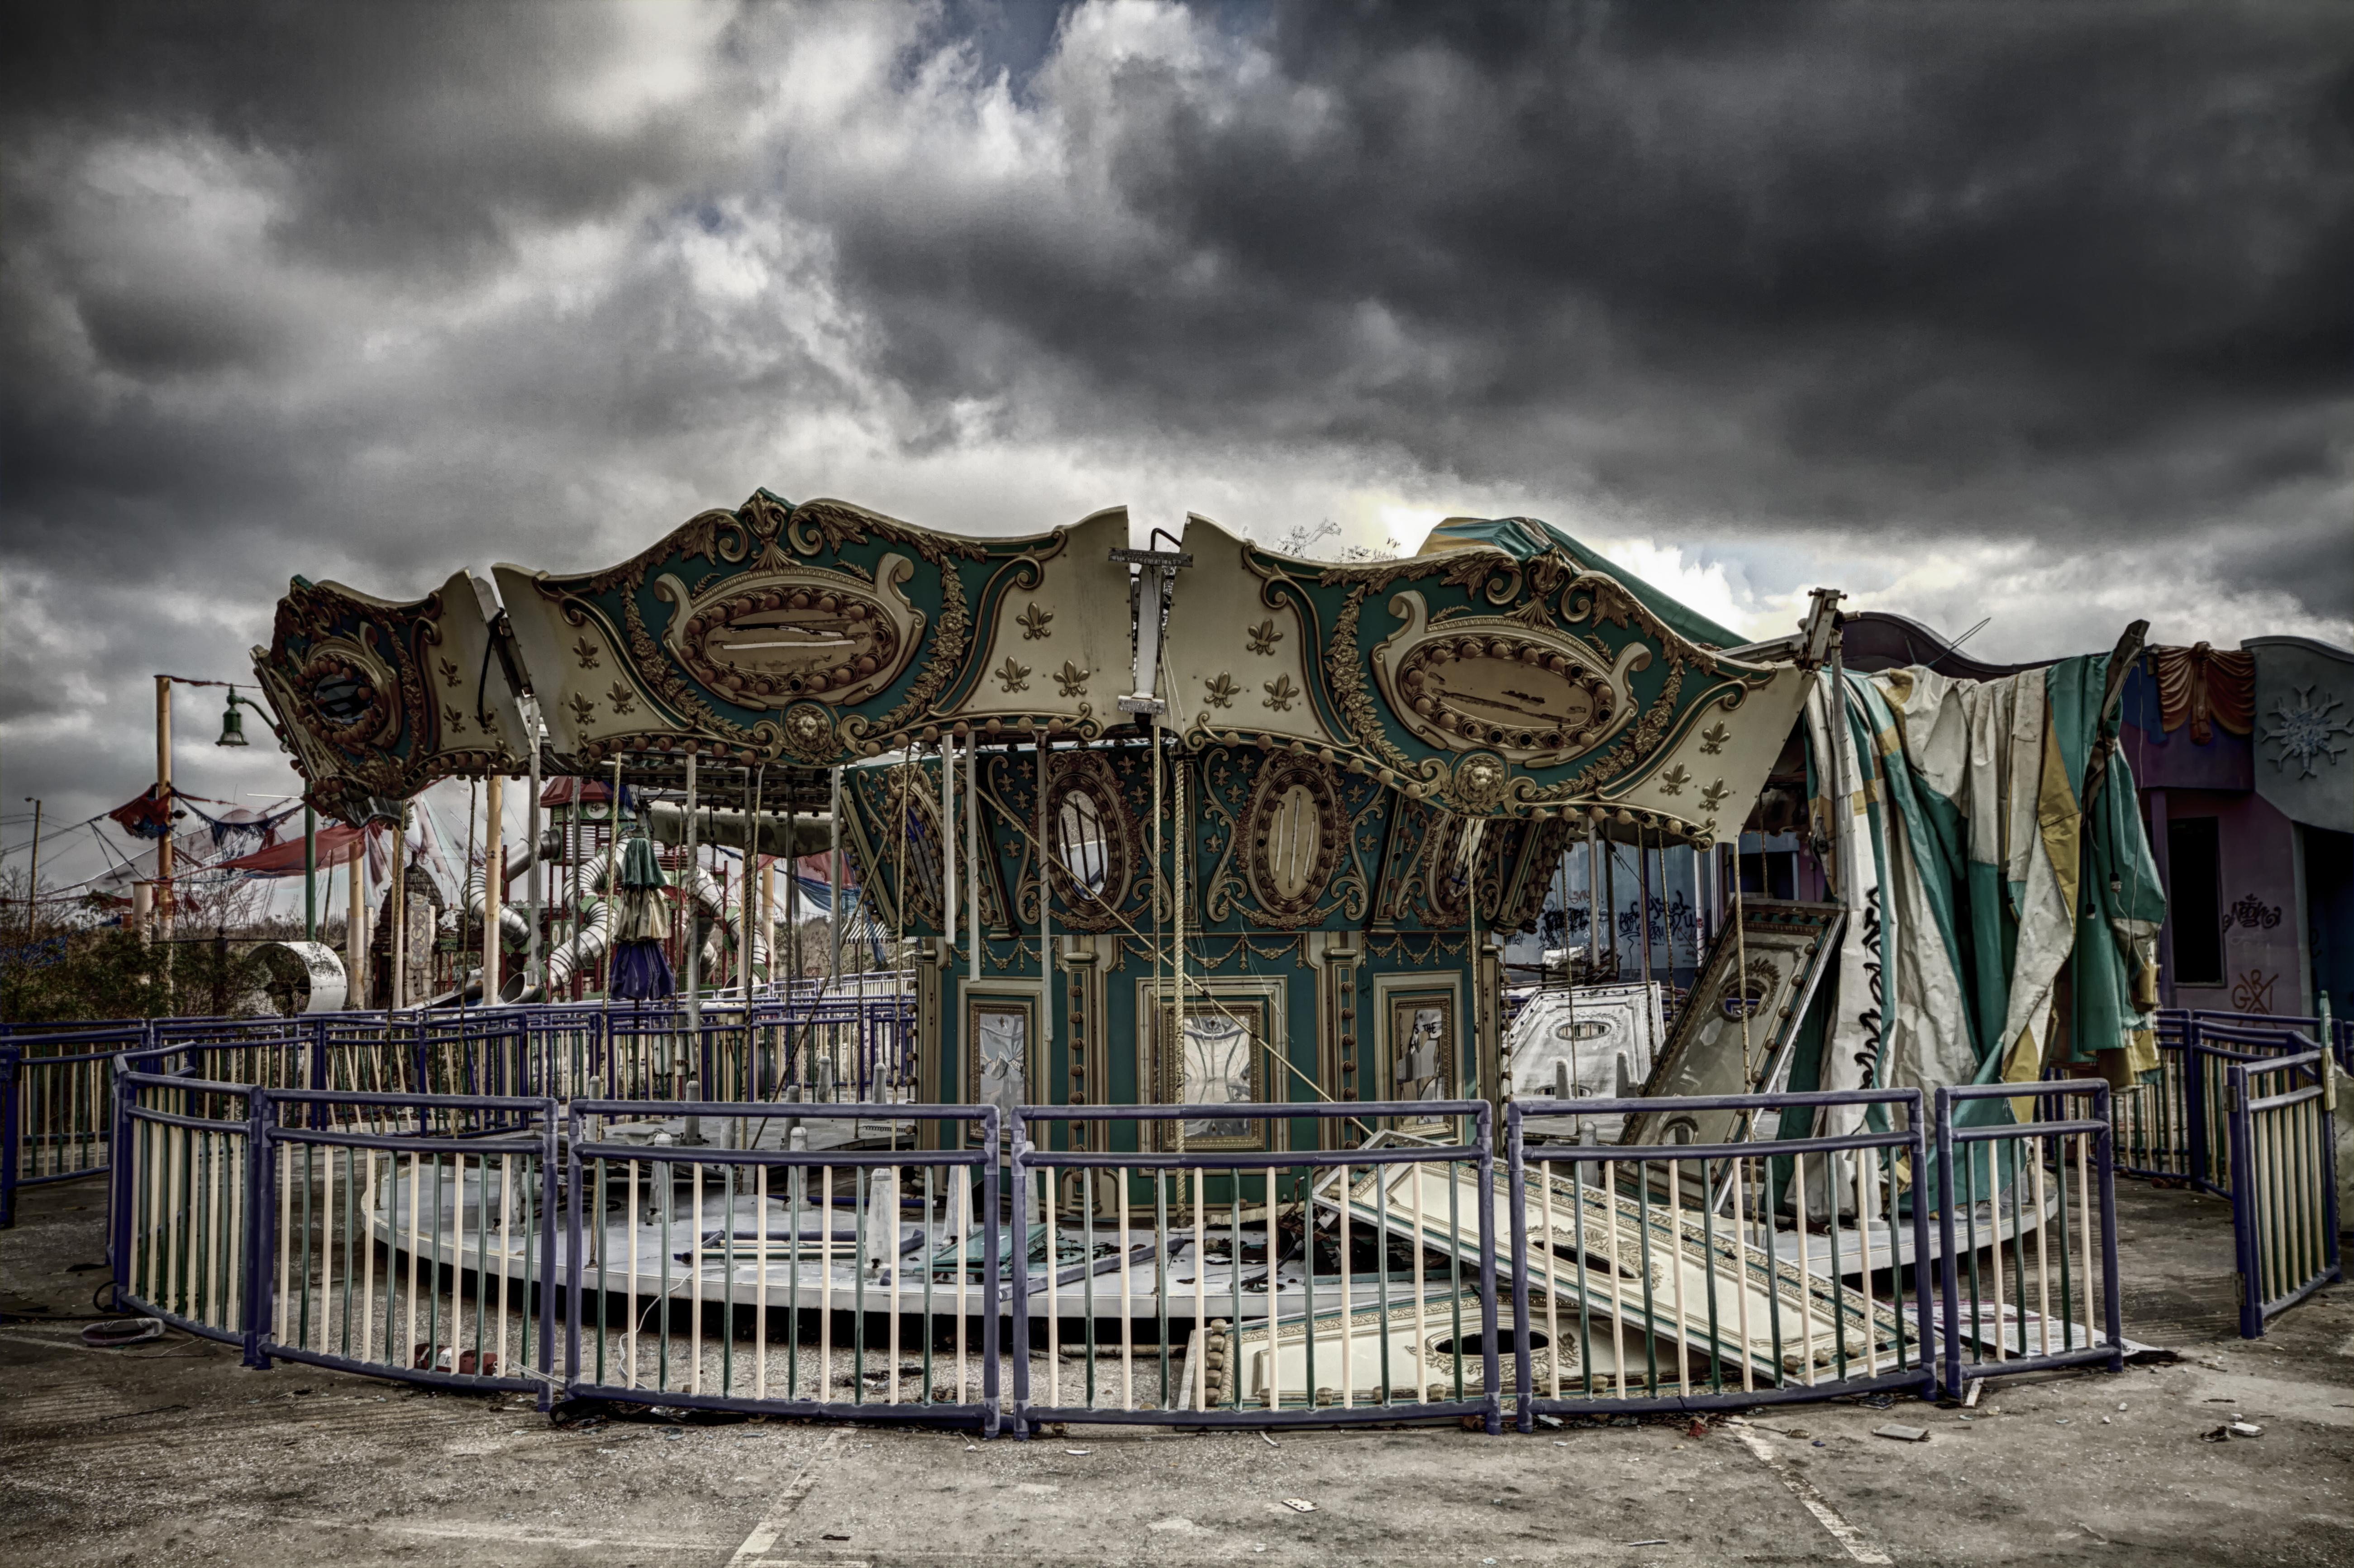 This Abandoned Amusement Park In Louisiana Will Definitely